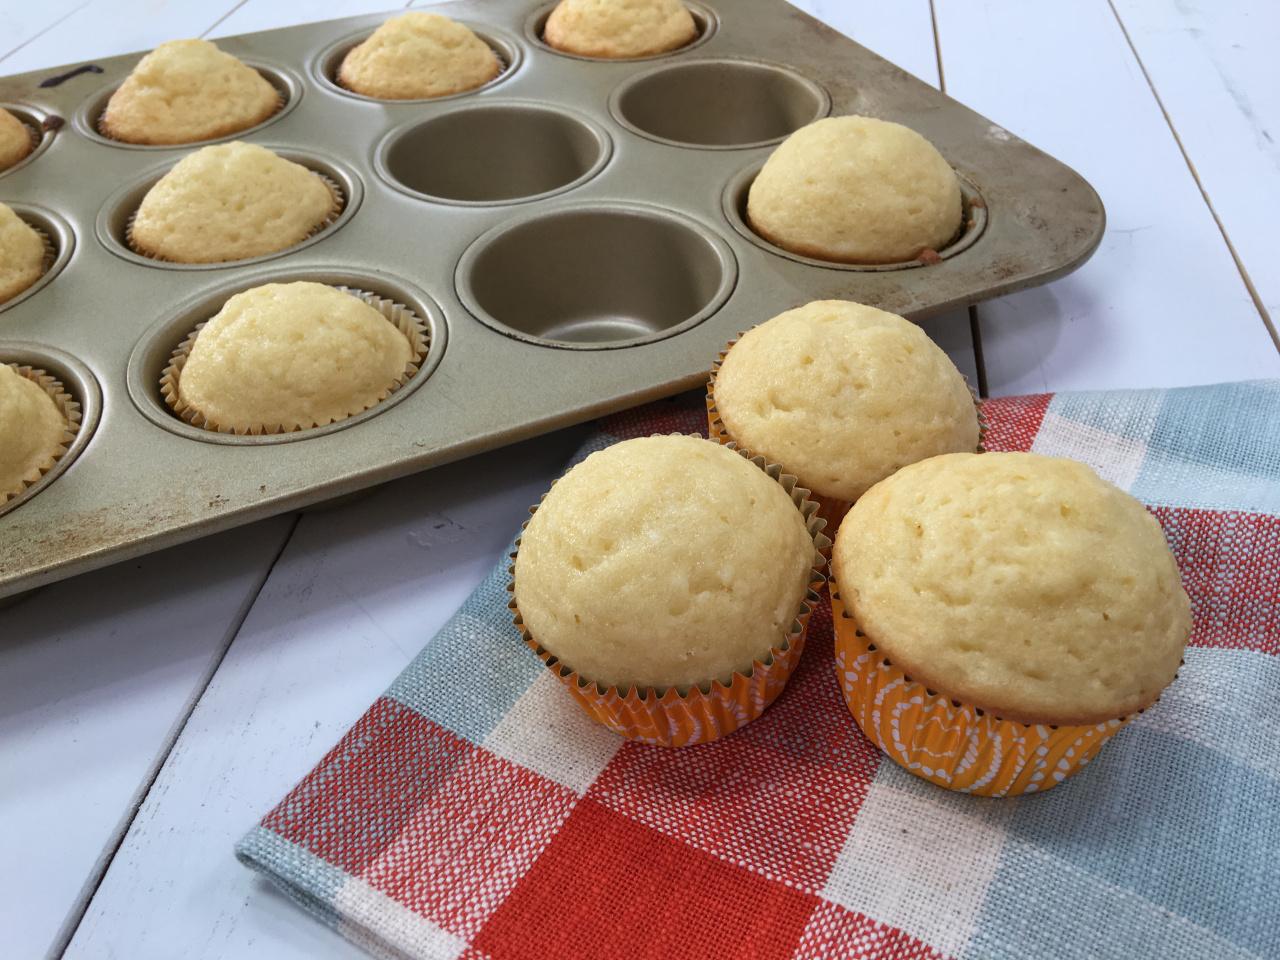 1602 Krispy Kreme muffins